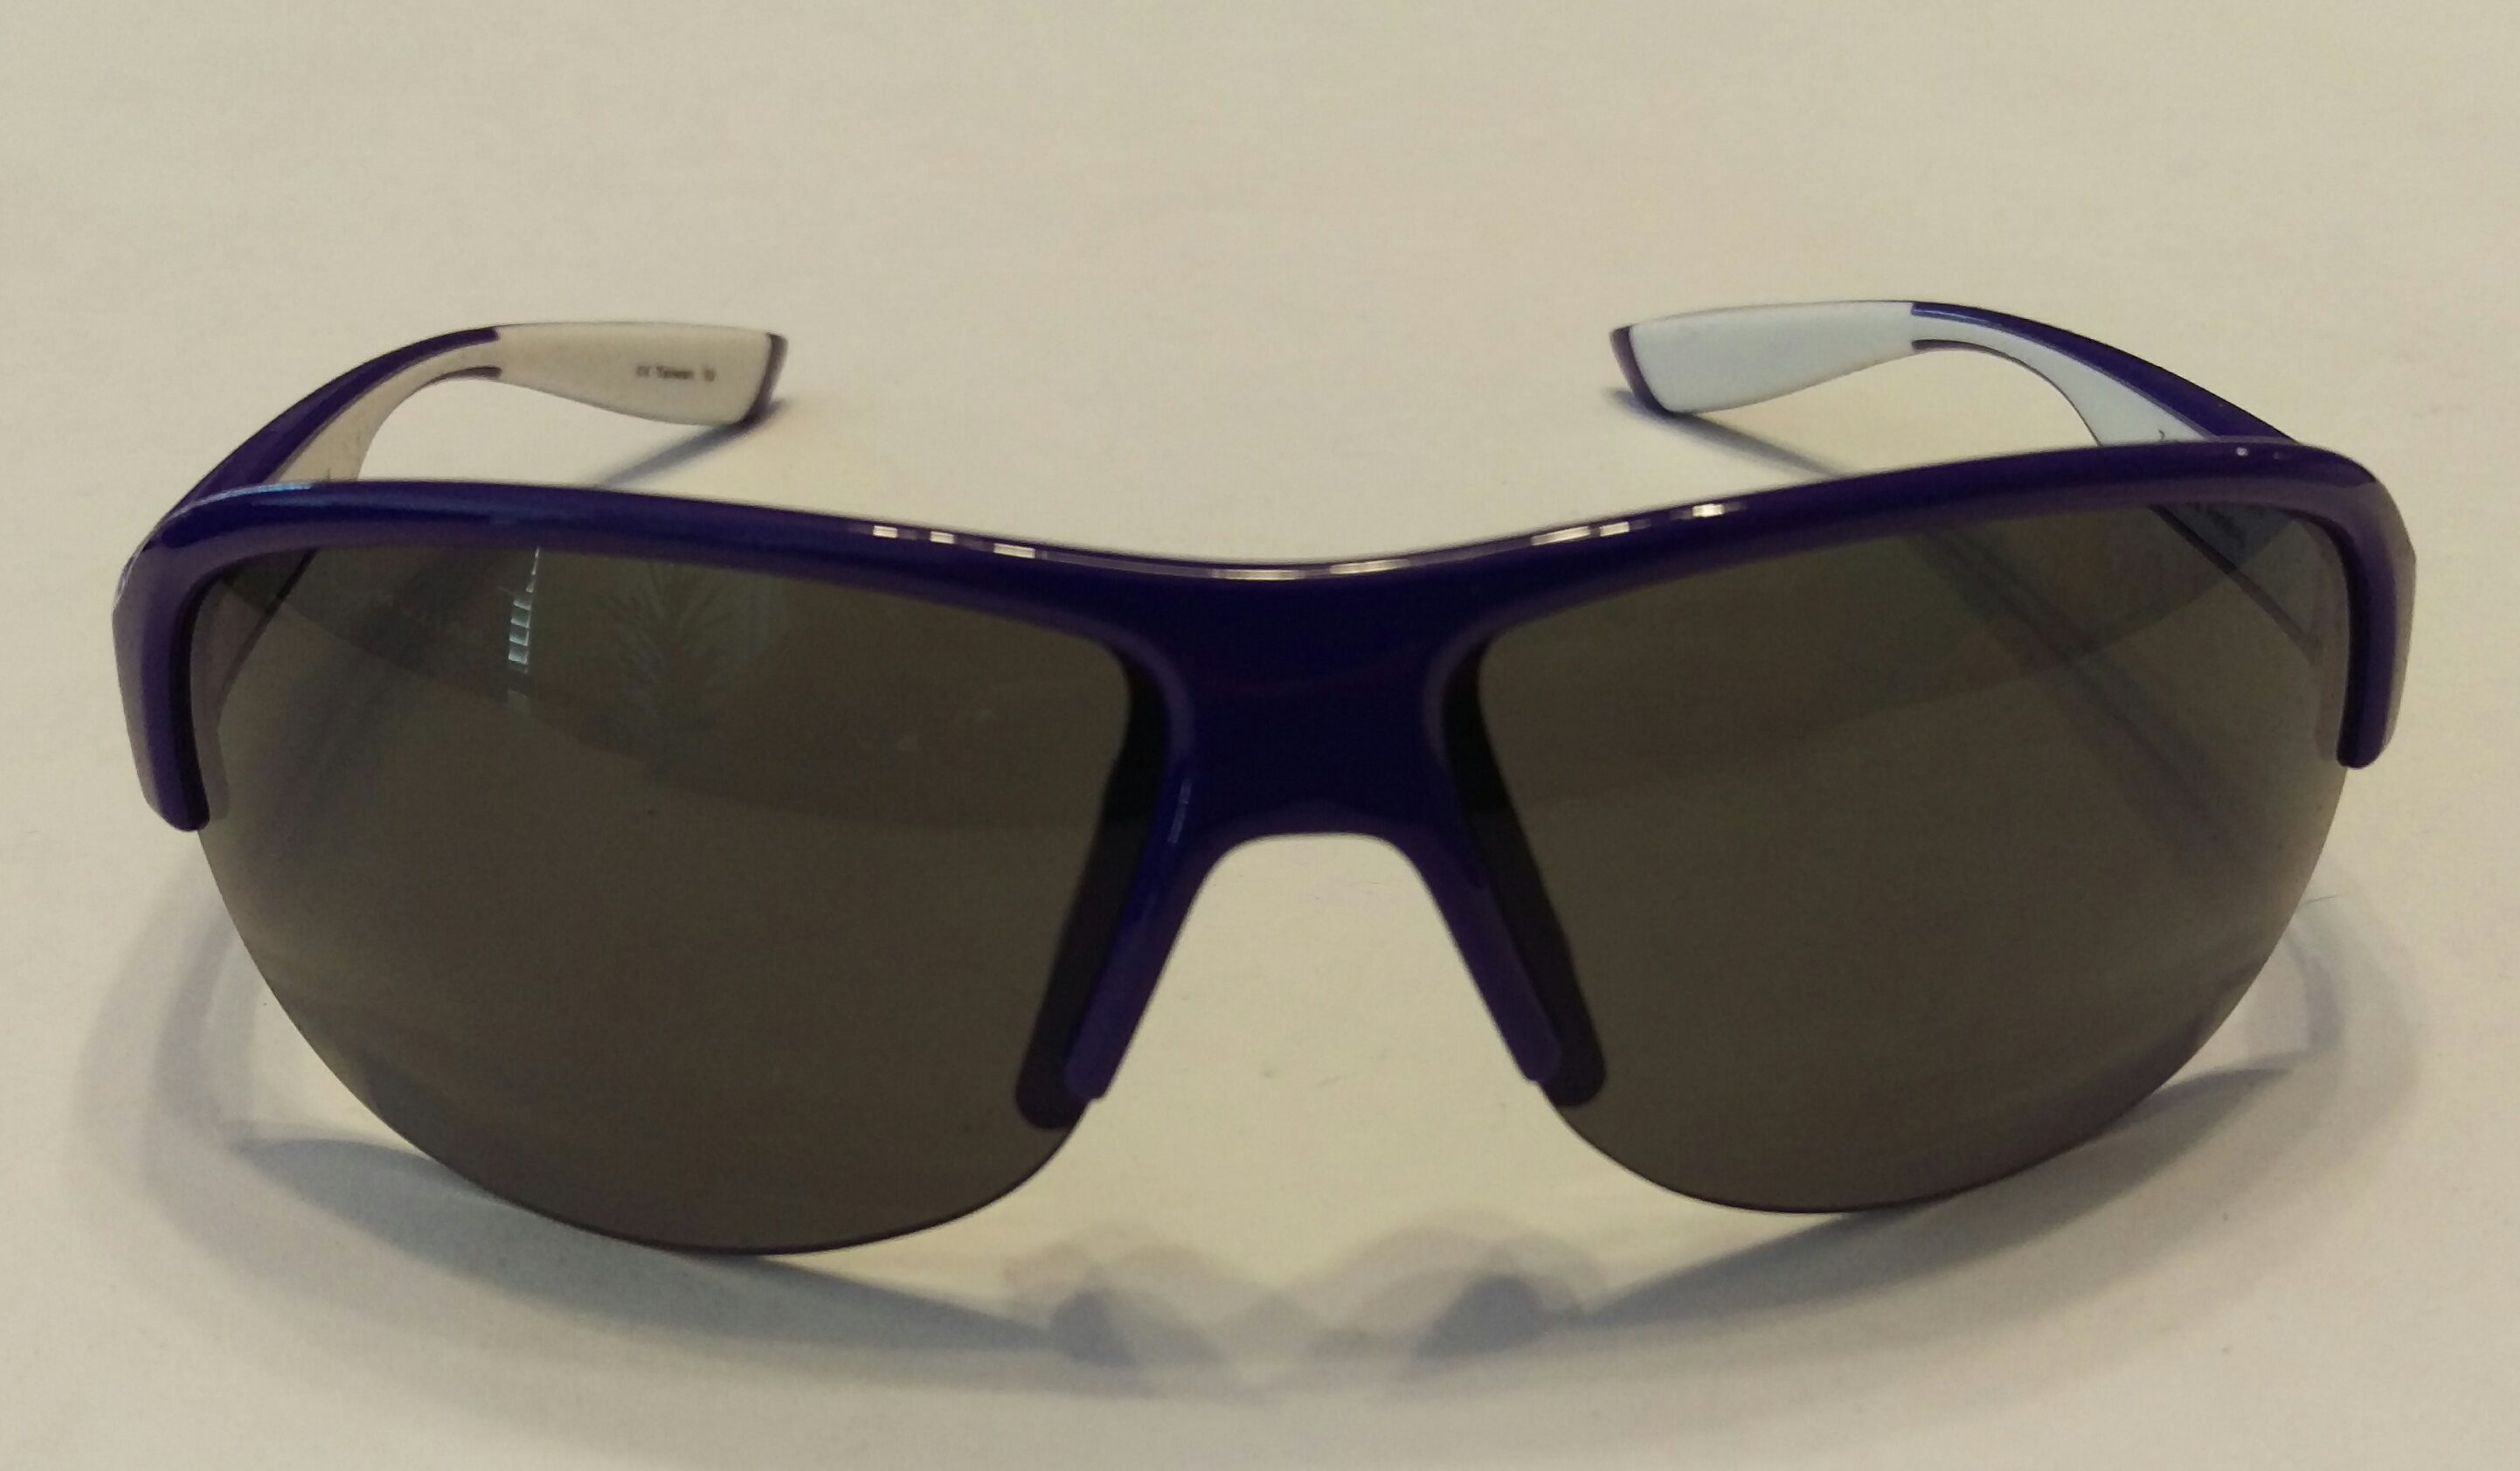 5d41b5702f9 Native Eyewear Zodiac Sunglasses – Ultraviolet Purple Frame – Polarized N3  Gray + Xtra Lens